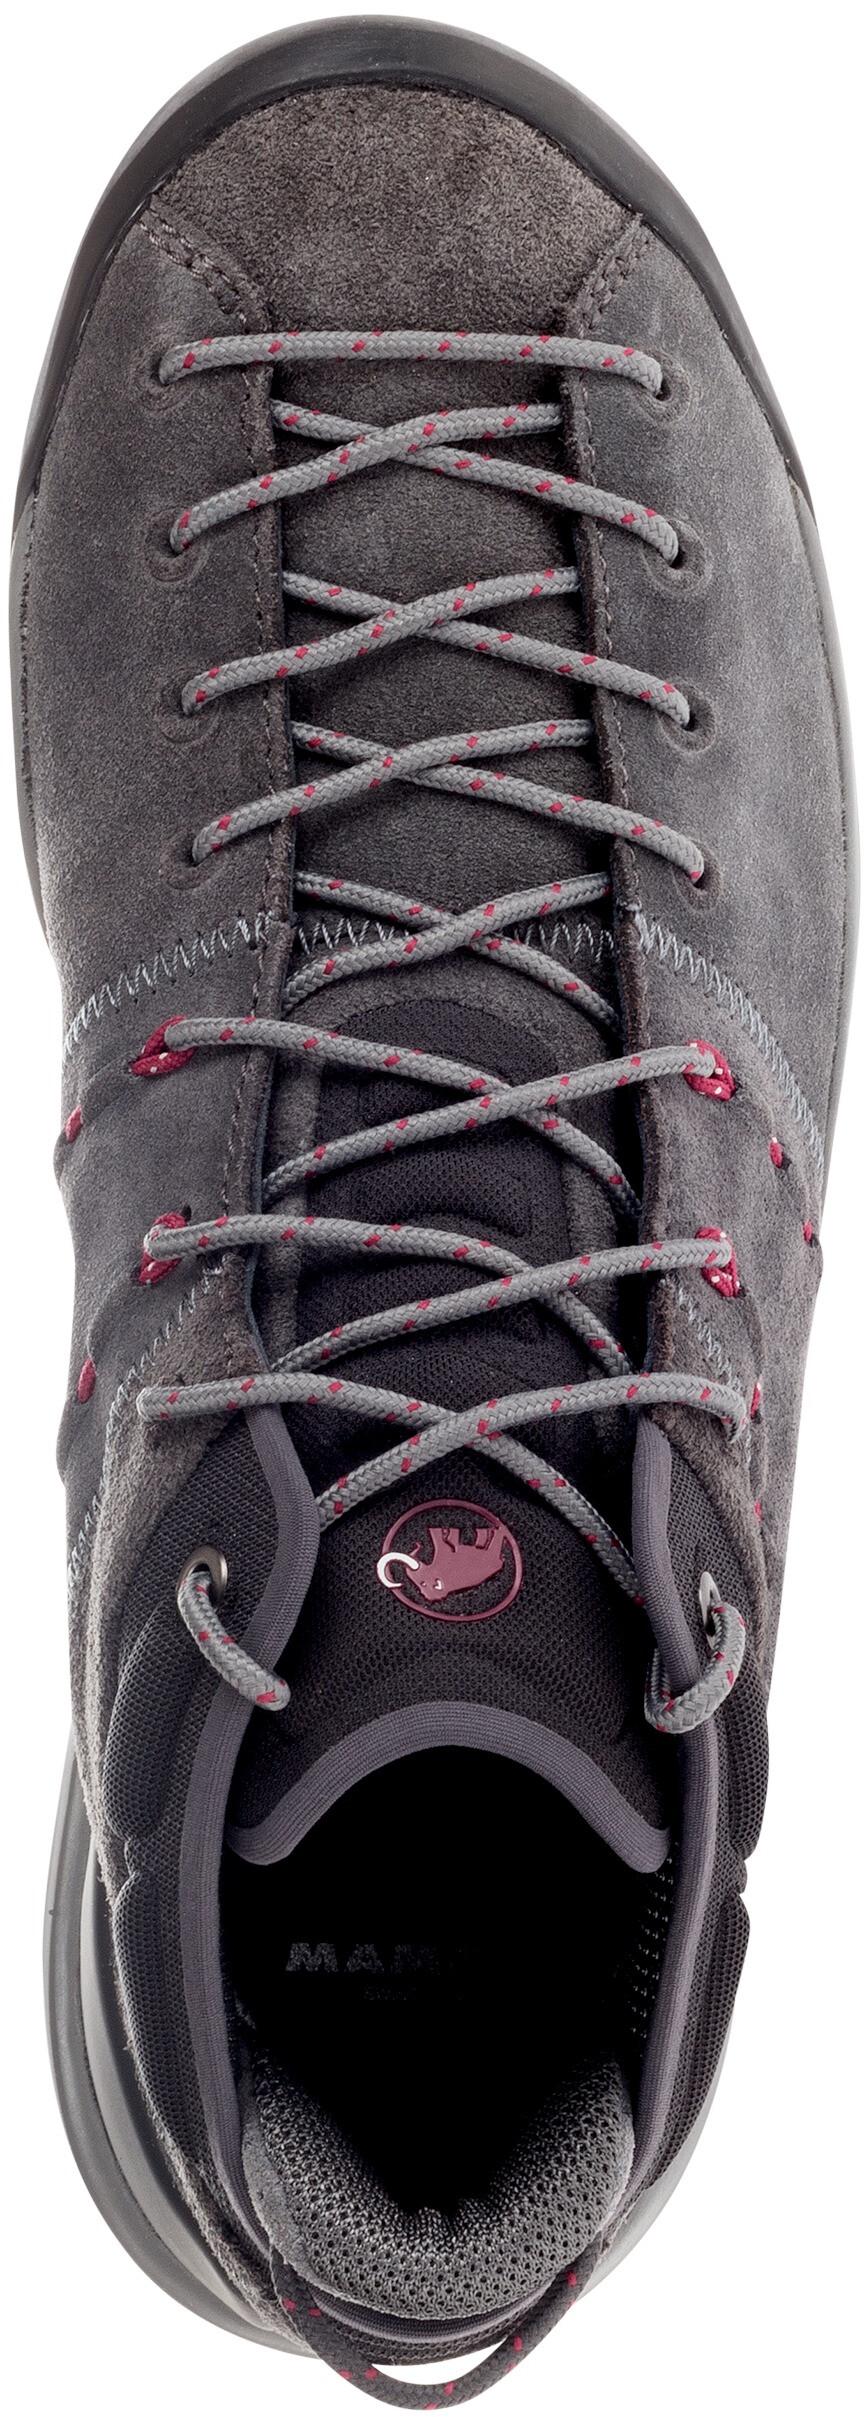 2a567943c3a3c3 Mammut Hueco Mid GTX Shoes Women grey at Addnature.co.uk